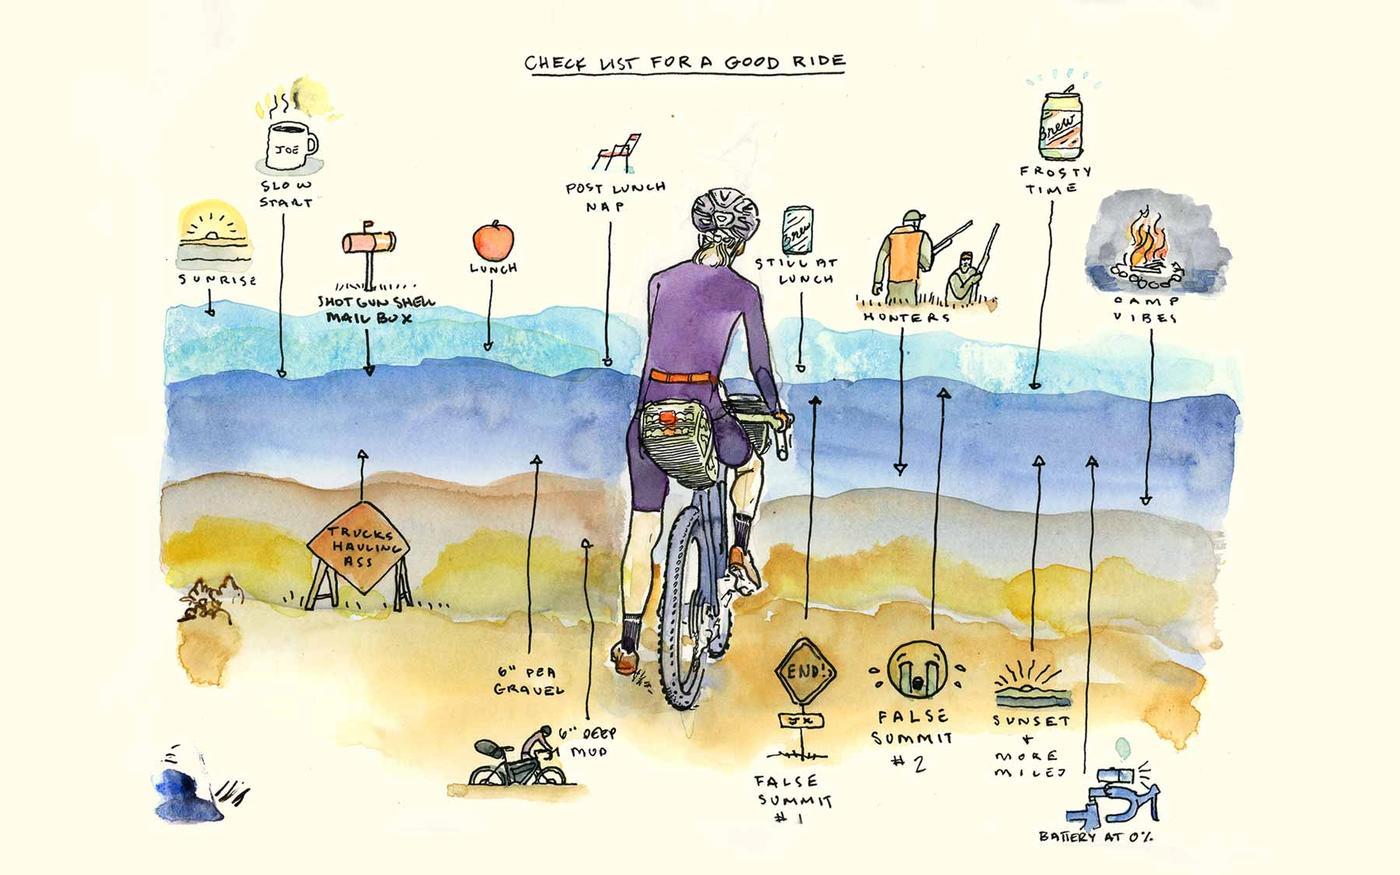 Chris McNally's New Belgium Ramble Ride Journal